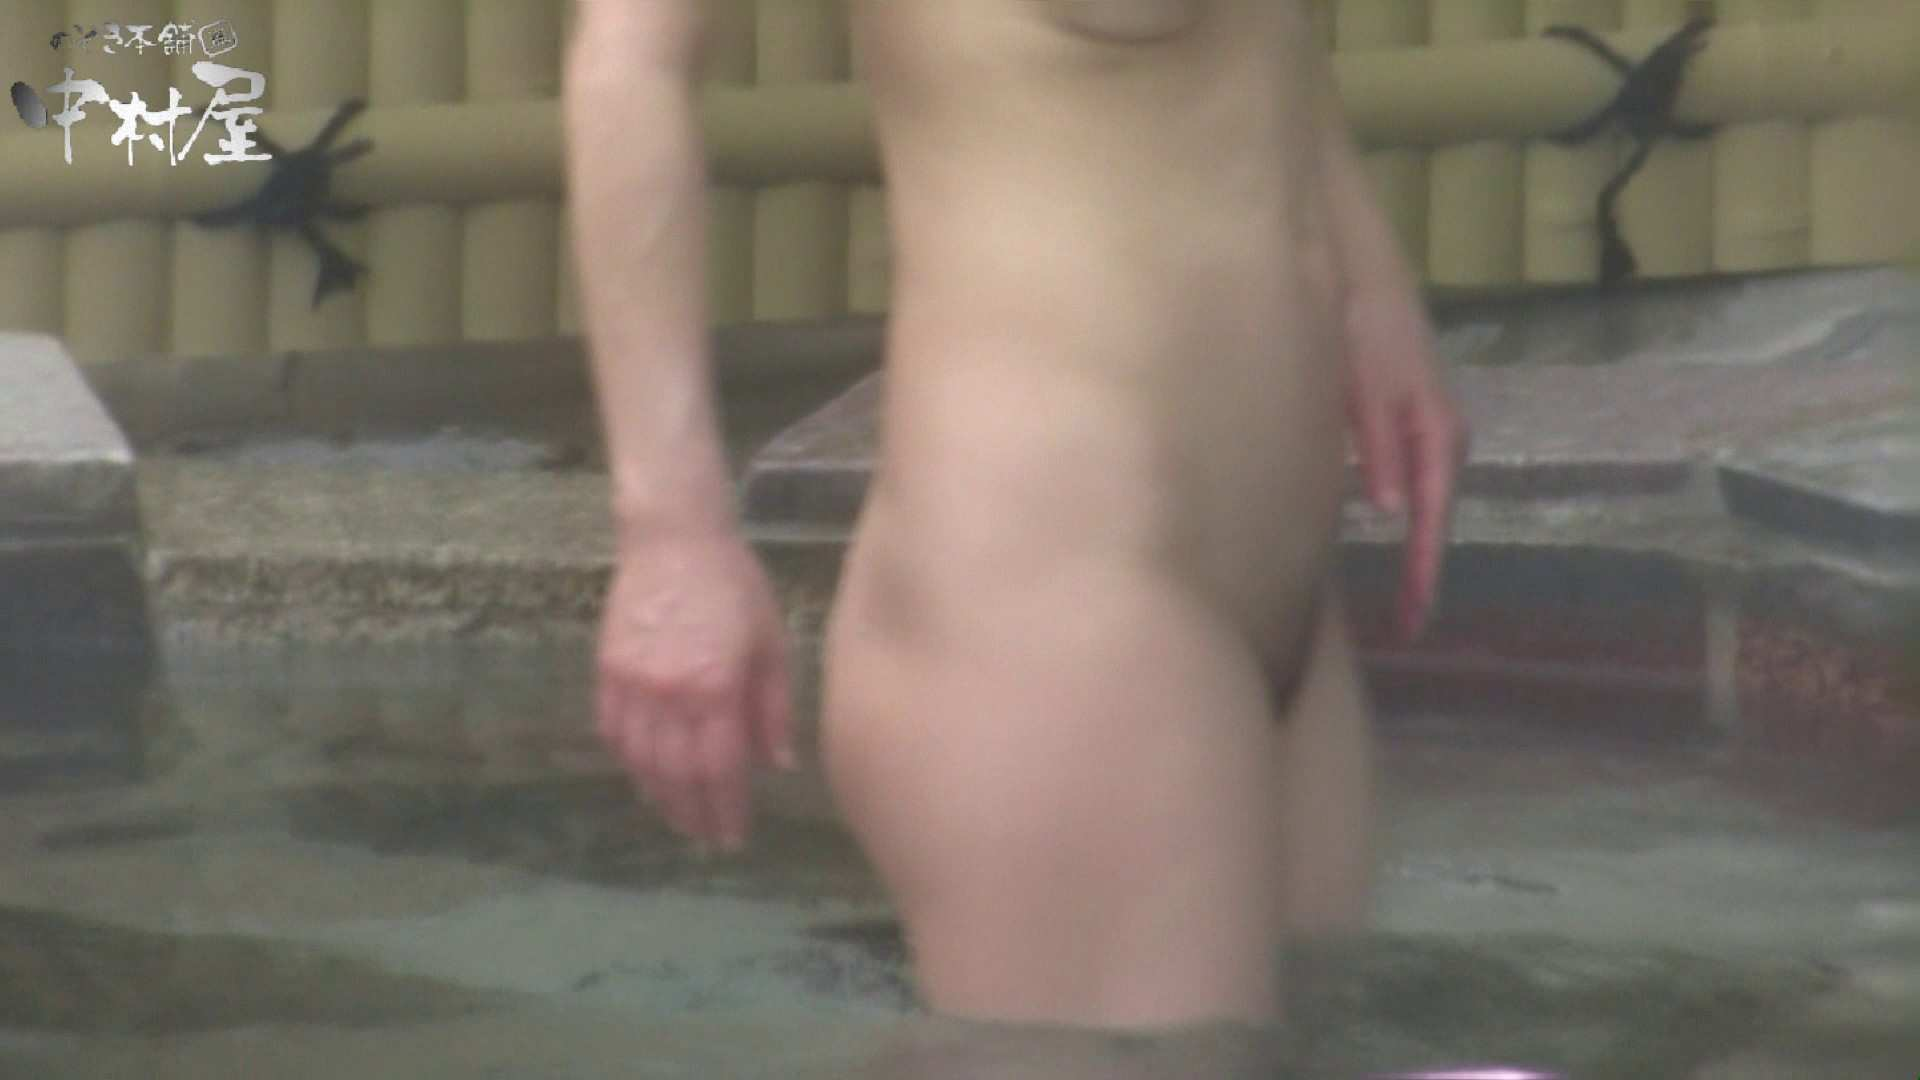 Aquaな露天風呂Vol.927 露天風呂 えろ無修正画像 89連発 89